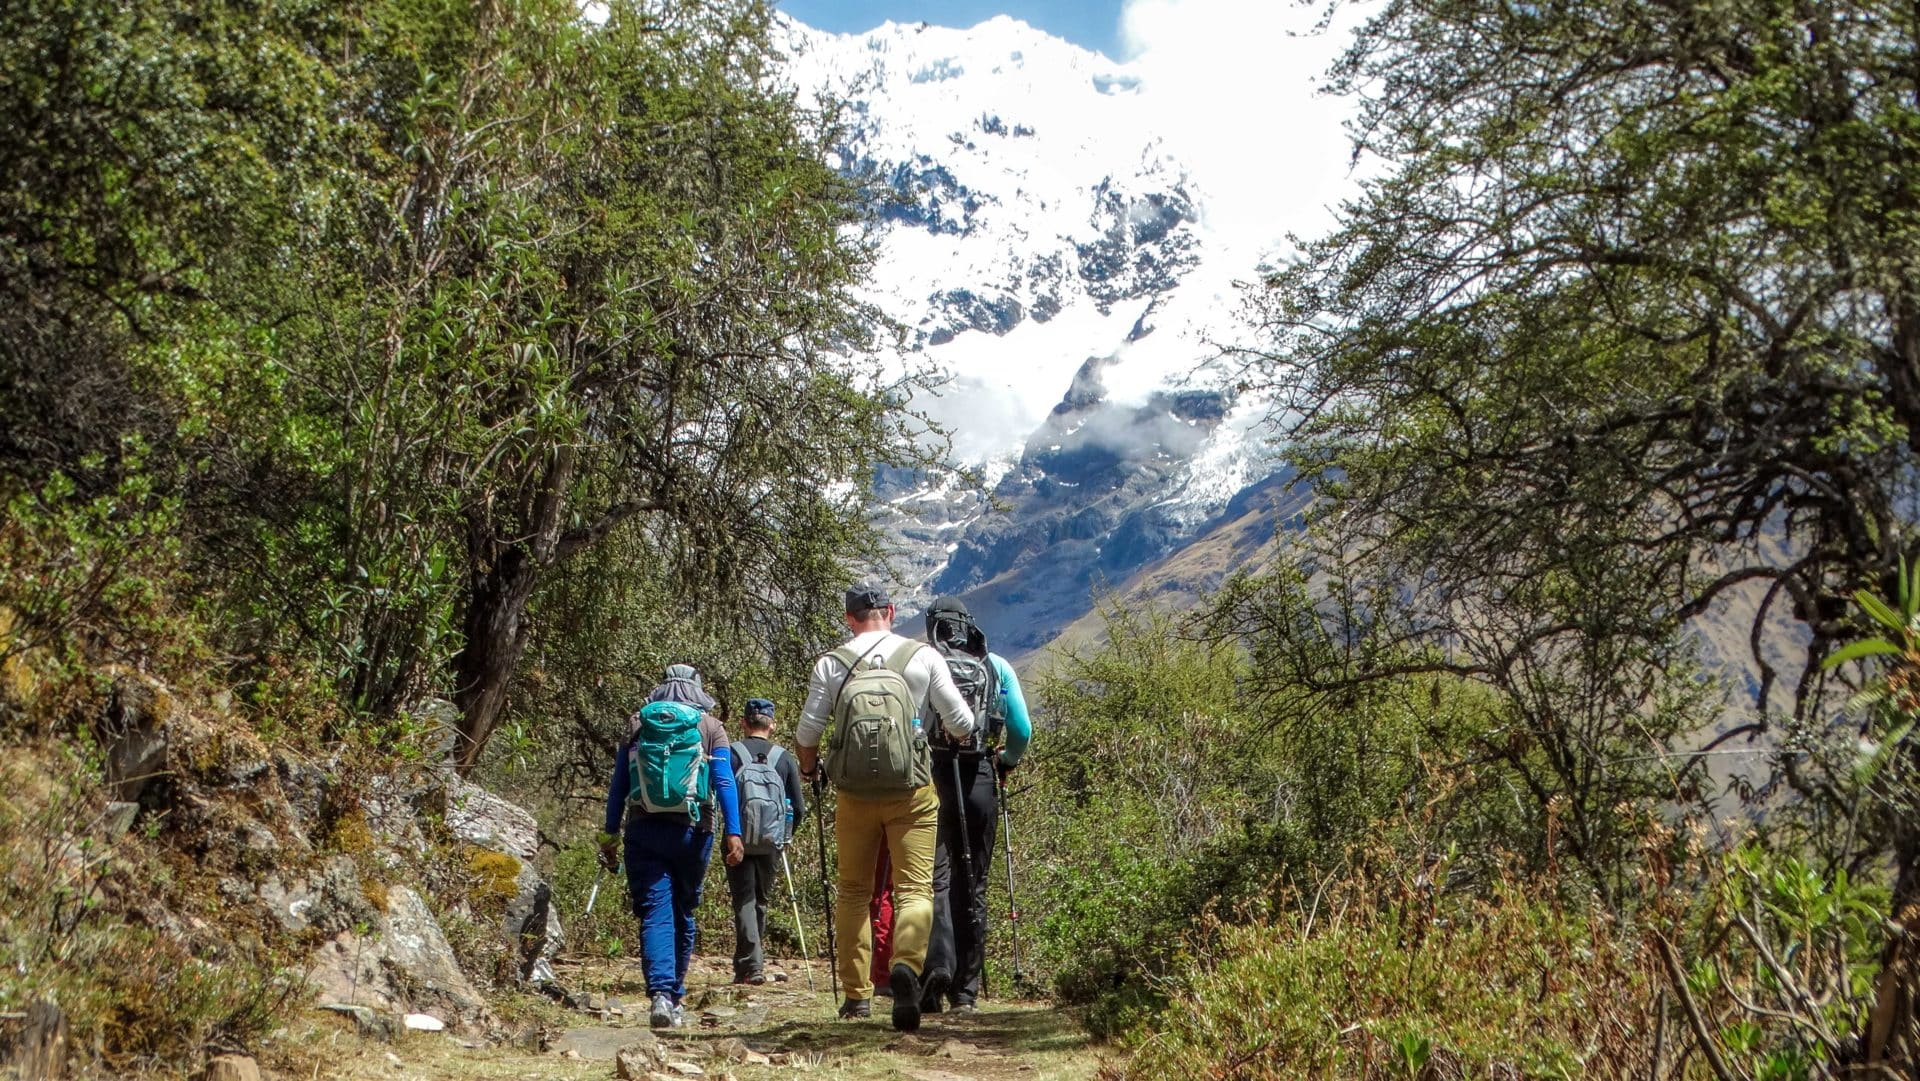 Salkantay trek: 5-day hiking trip to Machu Picchu